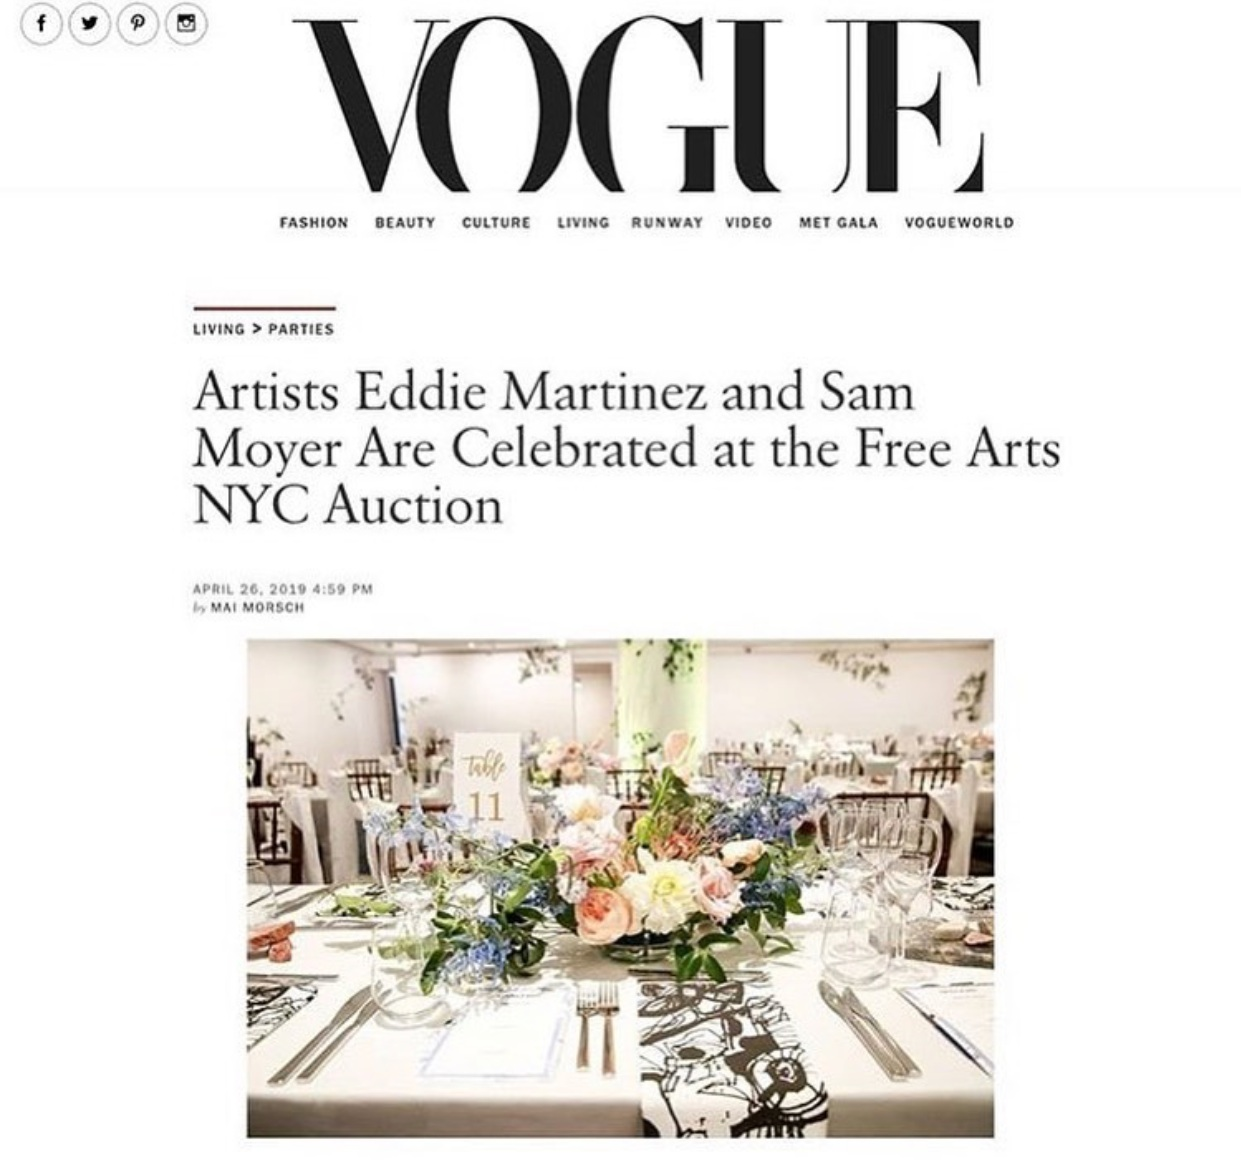 FREE ARTS AUCTION GALA 2019, VOGUE